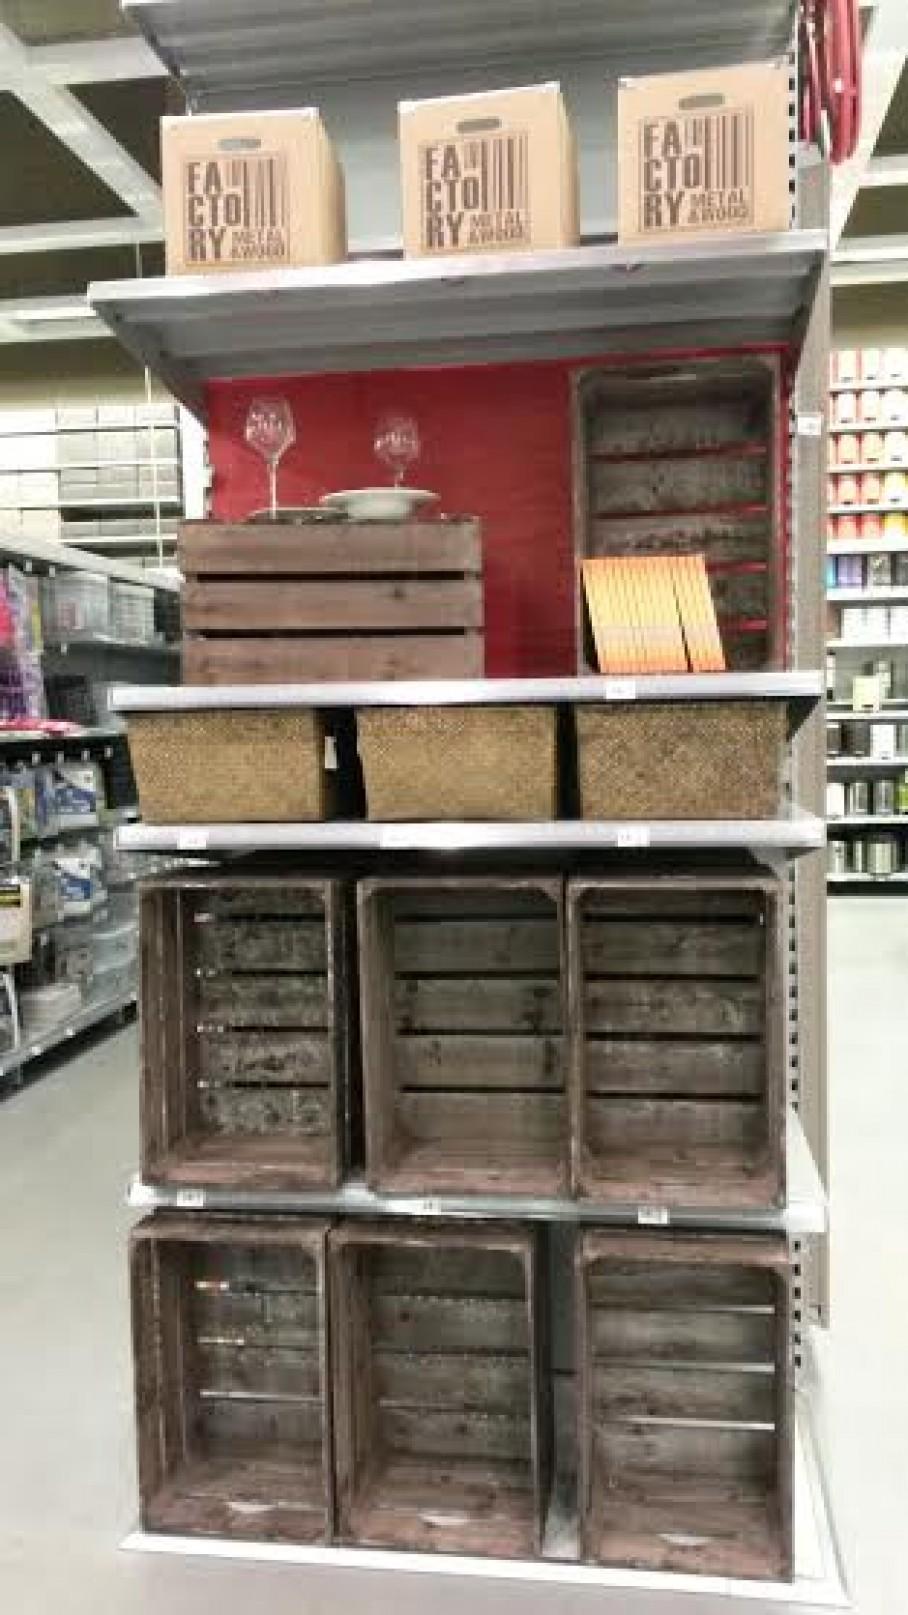 comment d tourner une caisse en bois blog z dio. Black Bedroom Furniture Sets. Home Design Ideas